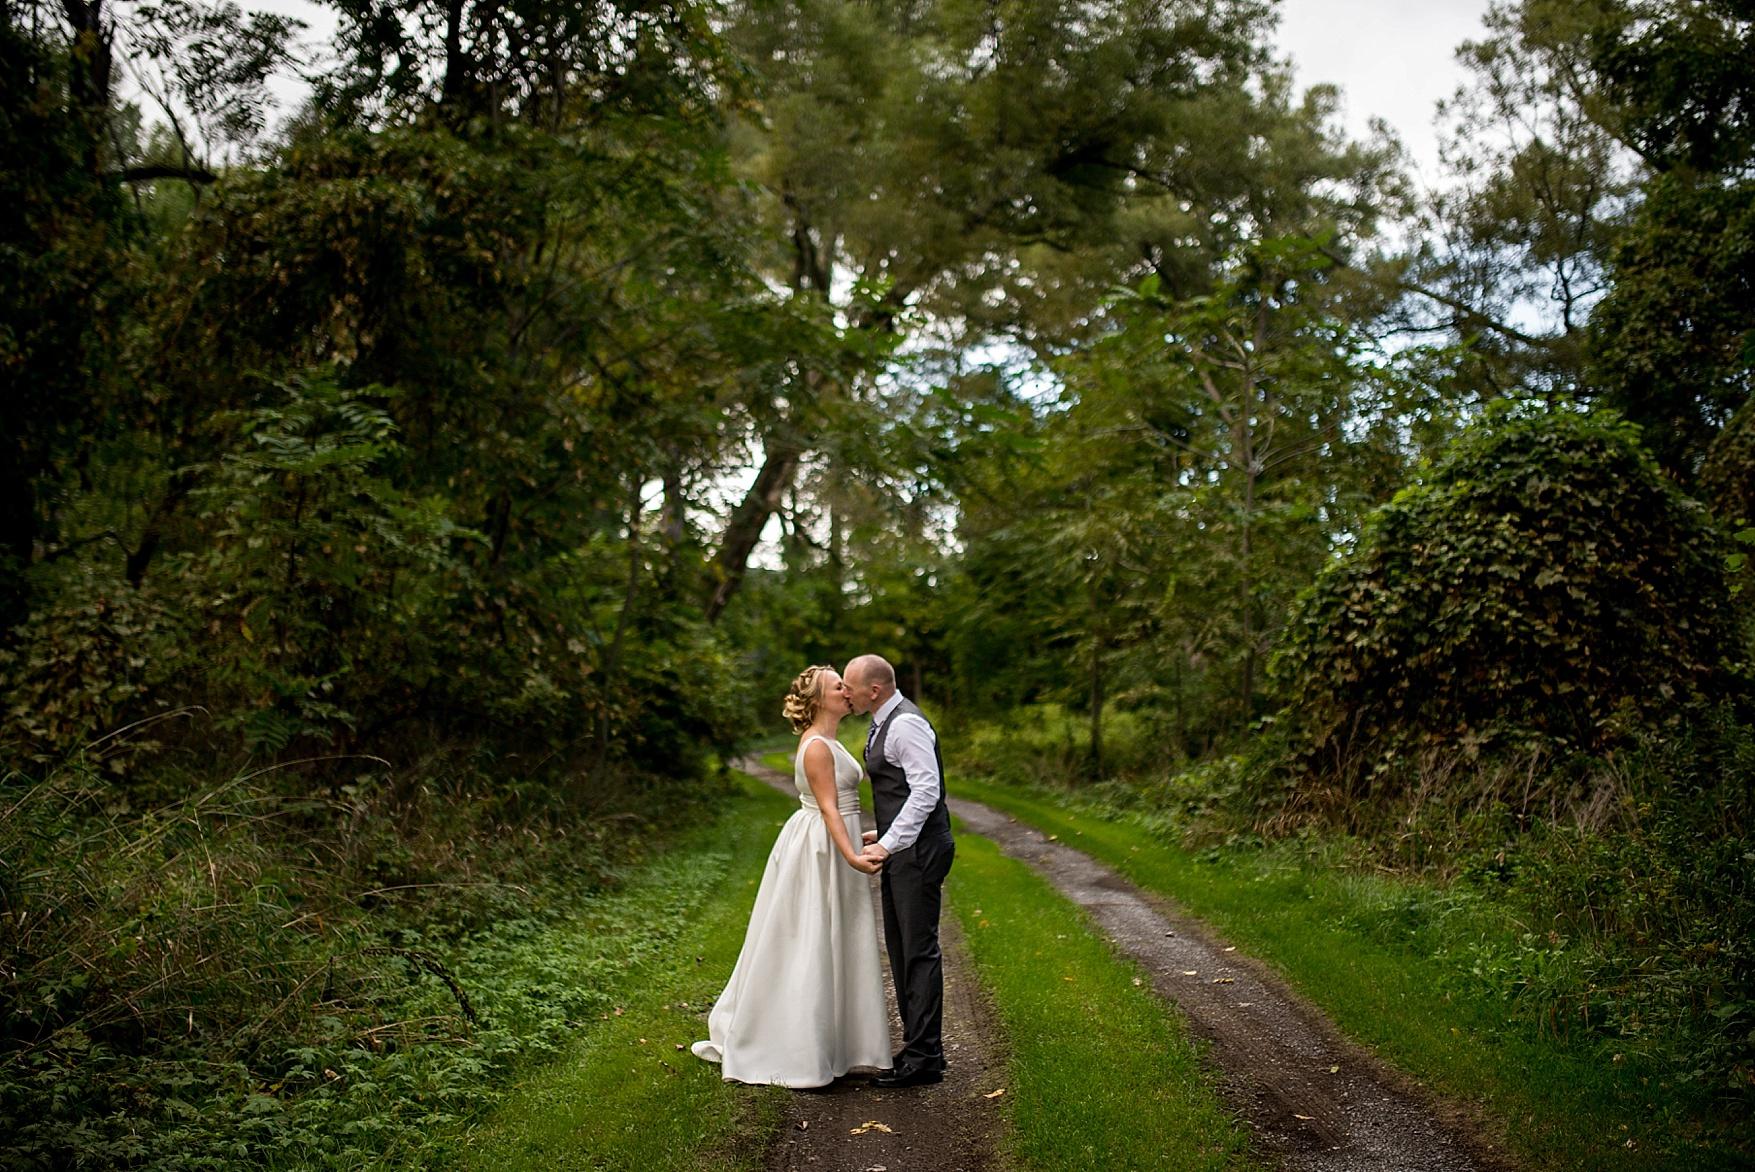 Prince Edward County elopement